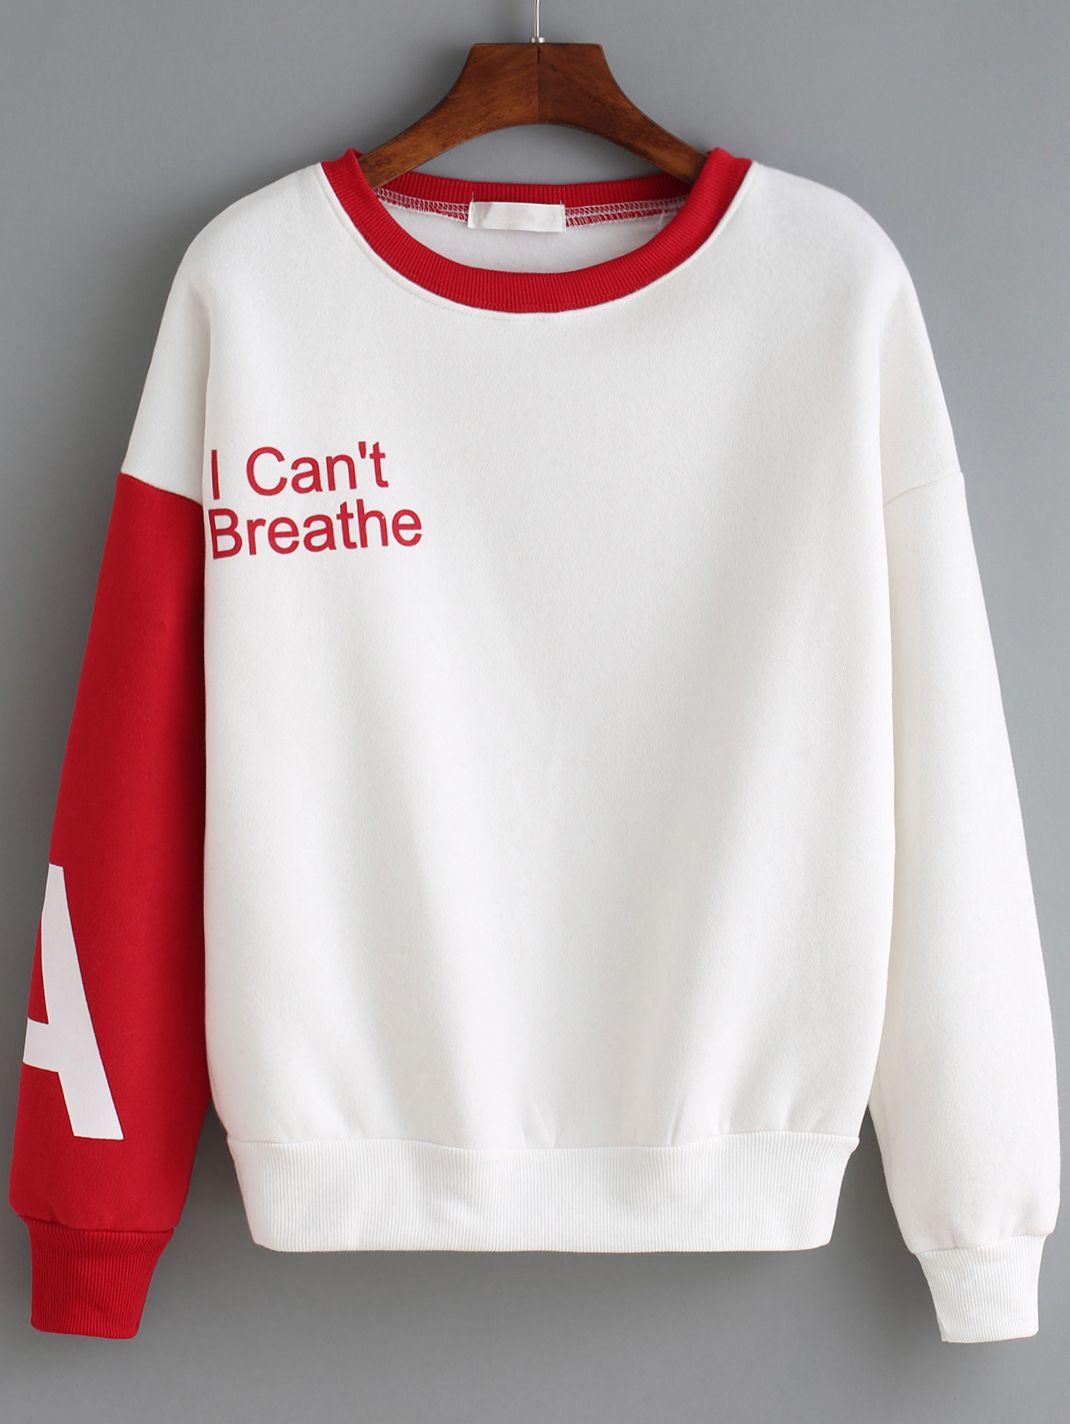 Red White Round Neck Letters Print Sweatshirt 16.14